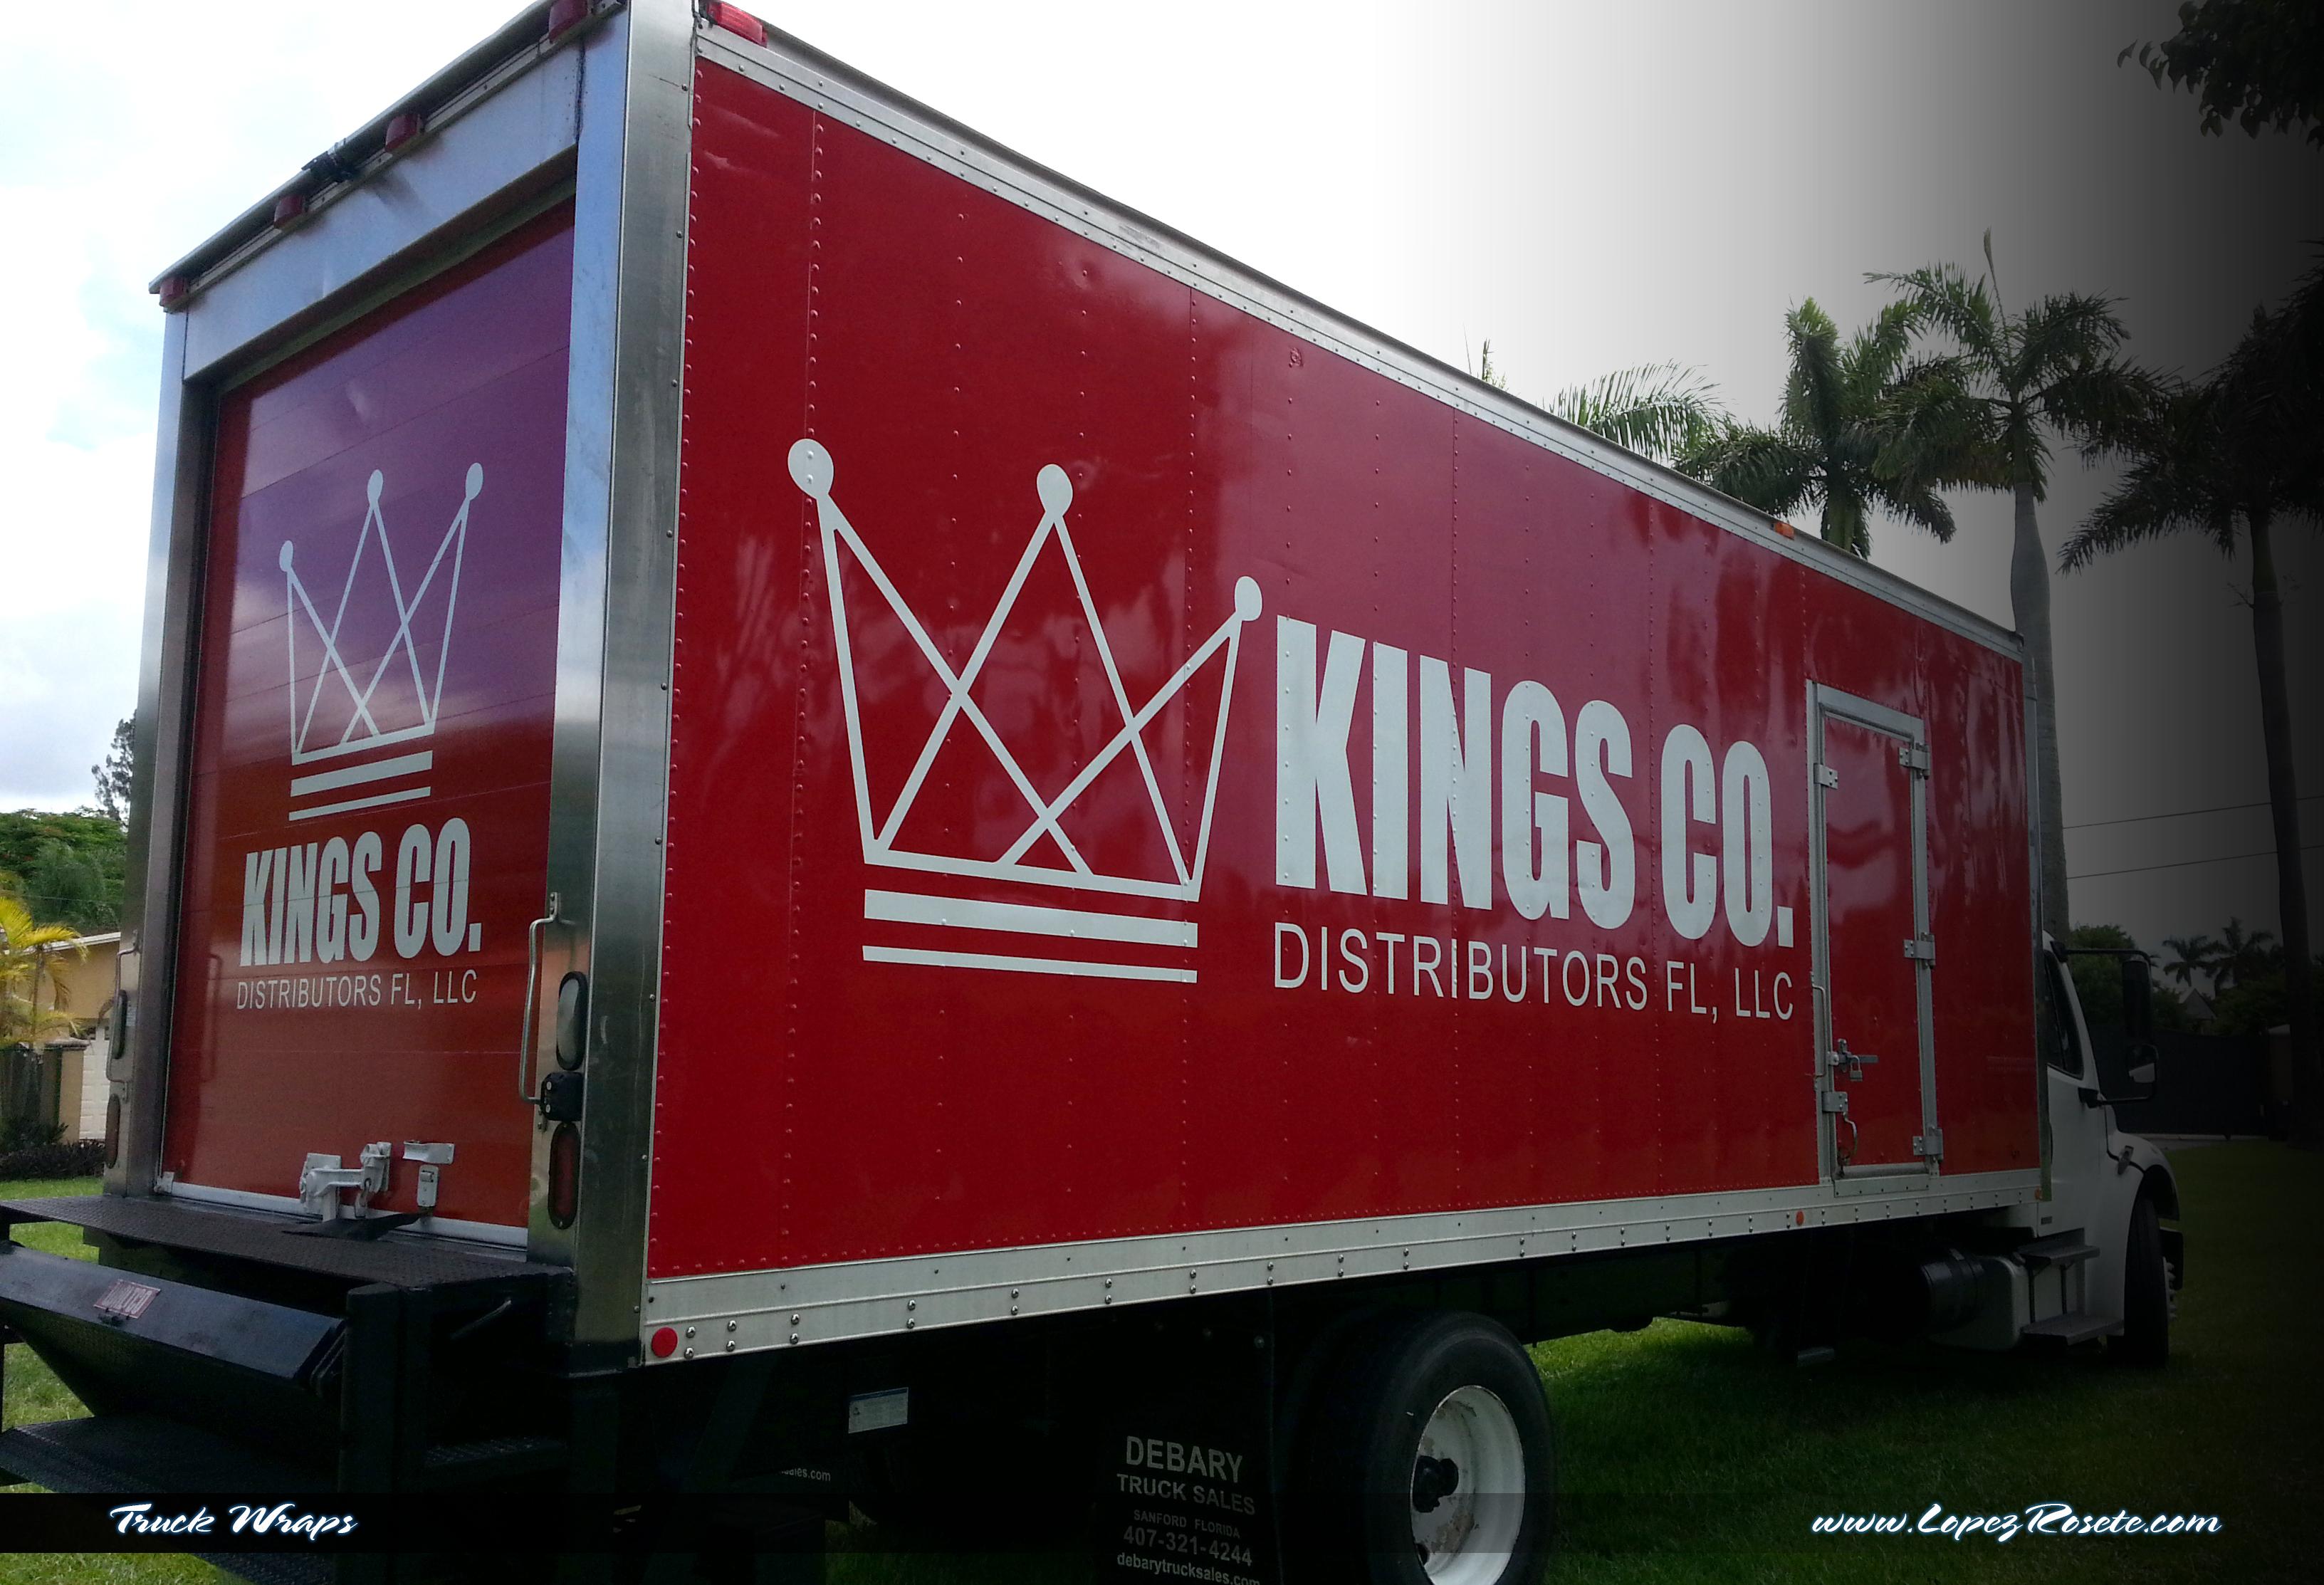 KingsCo